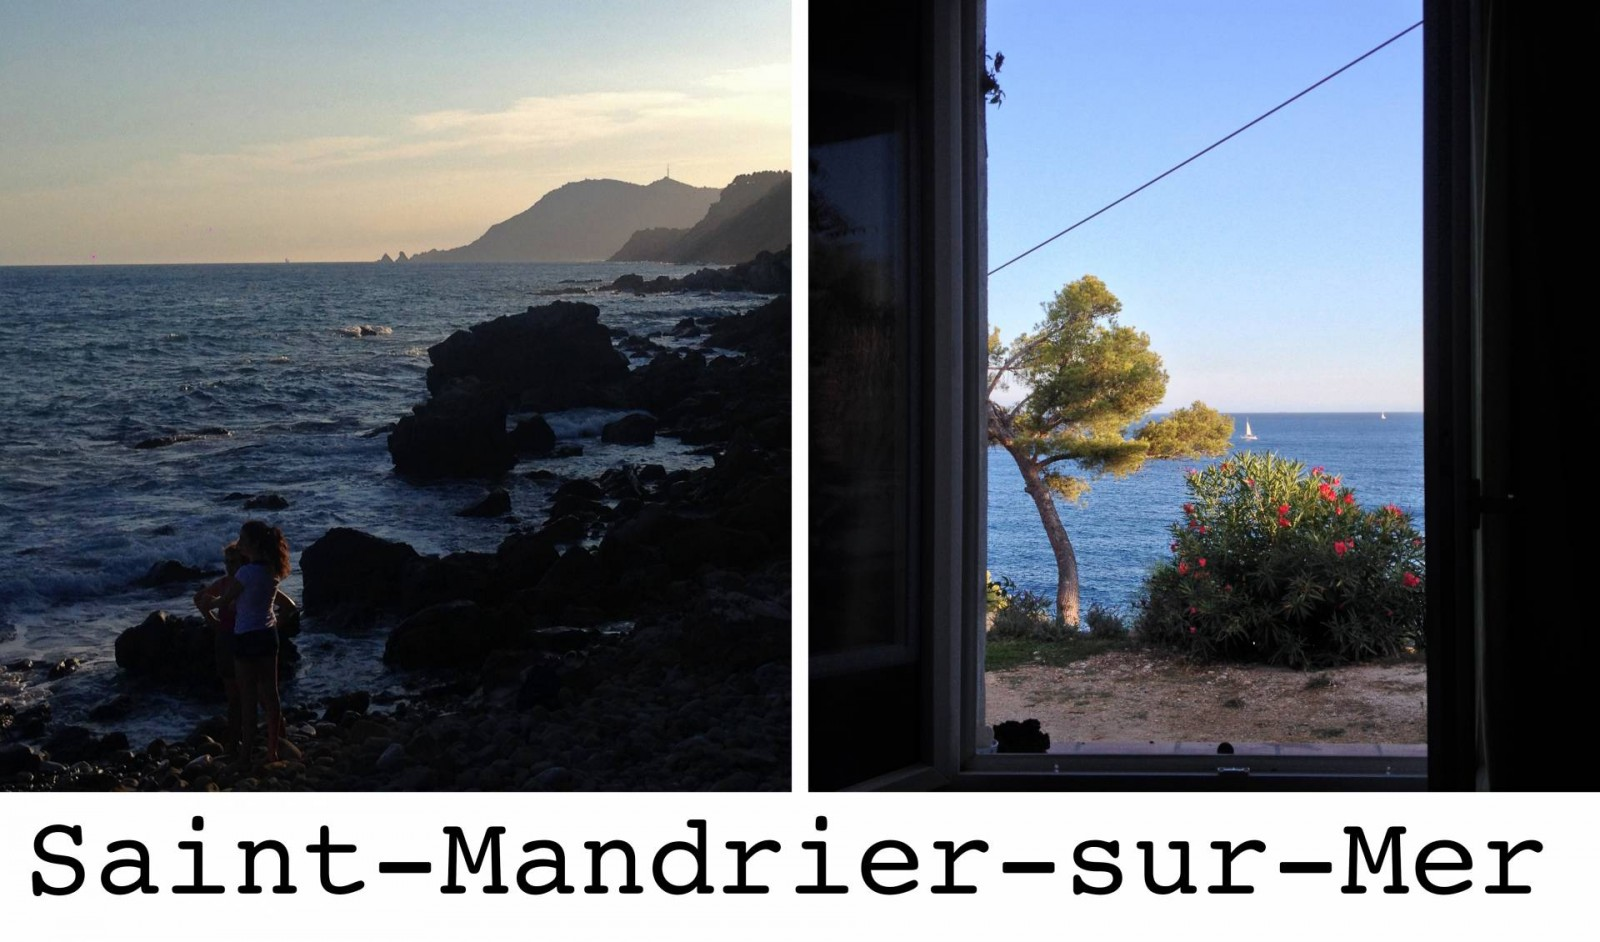 Saint-Mandrier-sur-Mer france